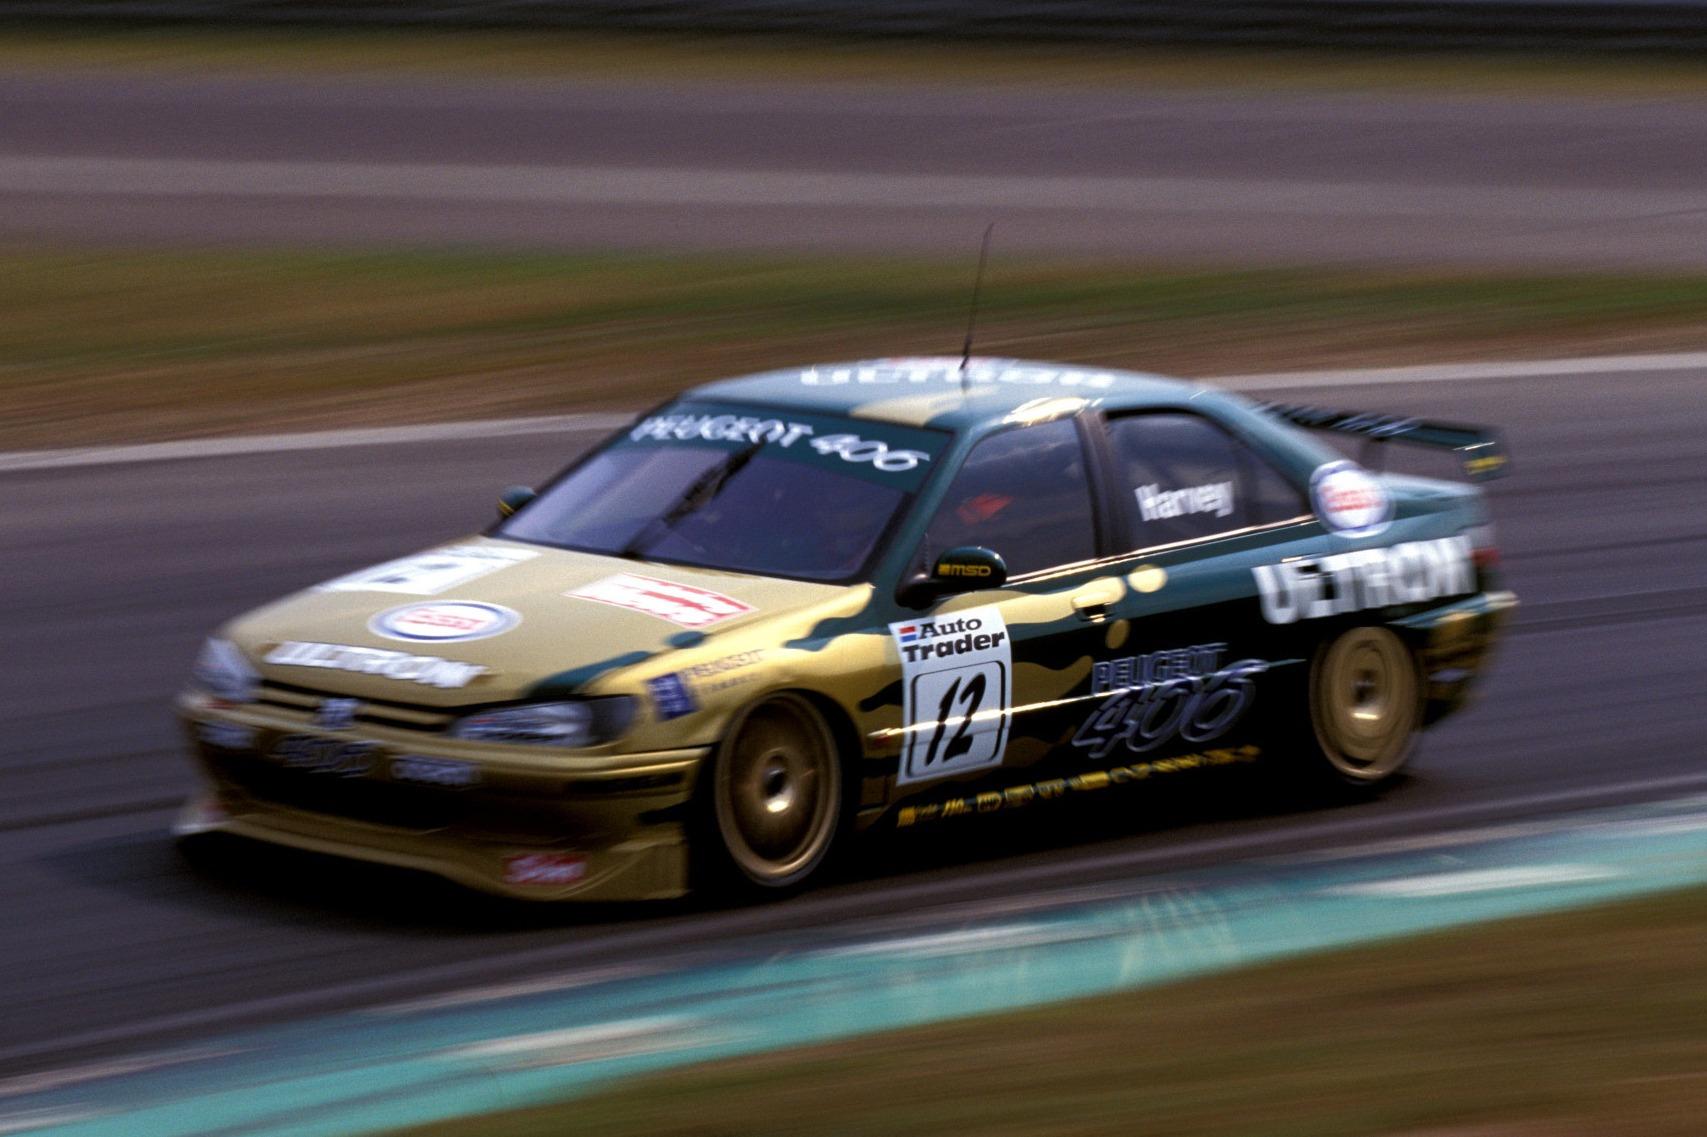 Tim Harvey, 1997 BTCC Snetterton